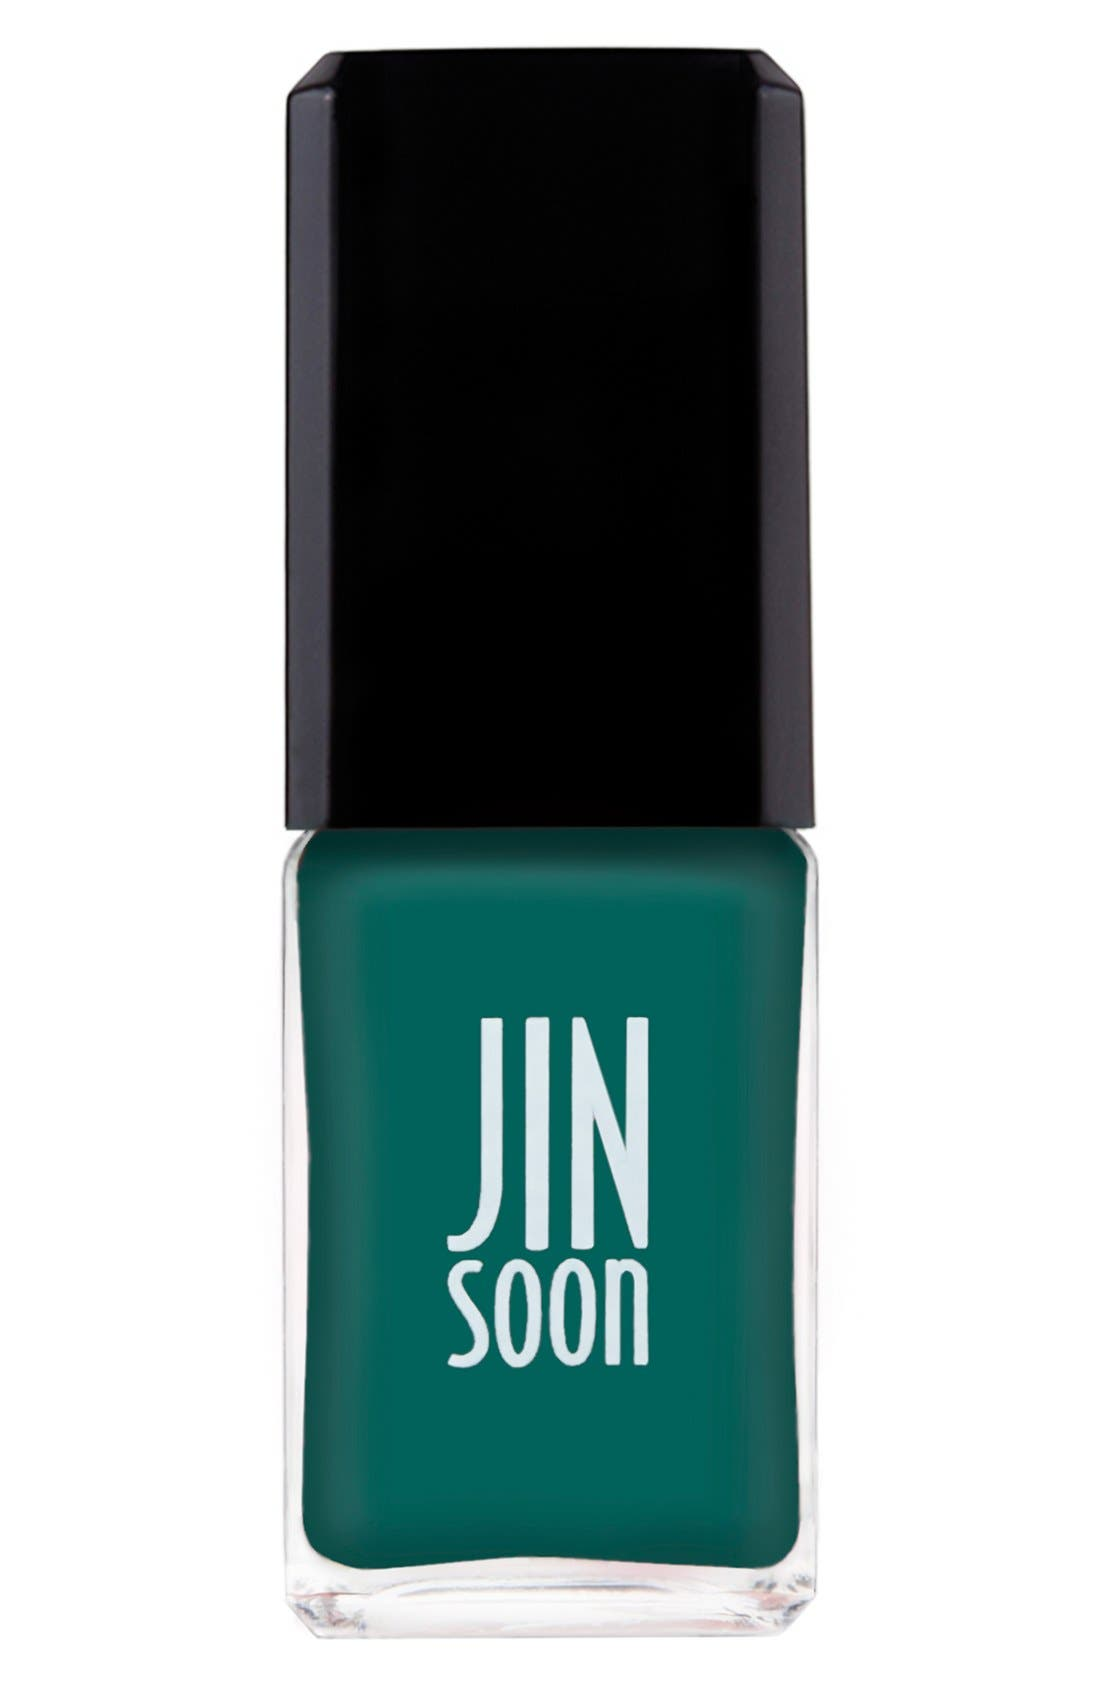 JINsoon 'Tila' Nail Polish